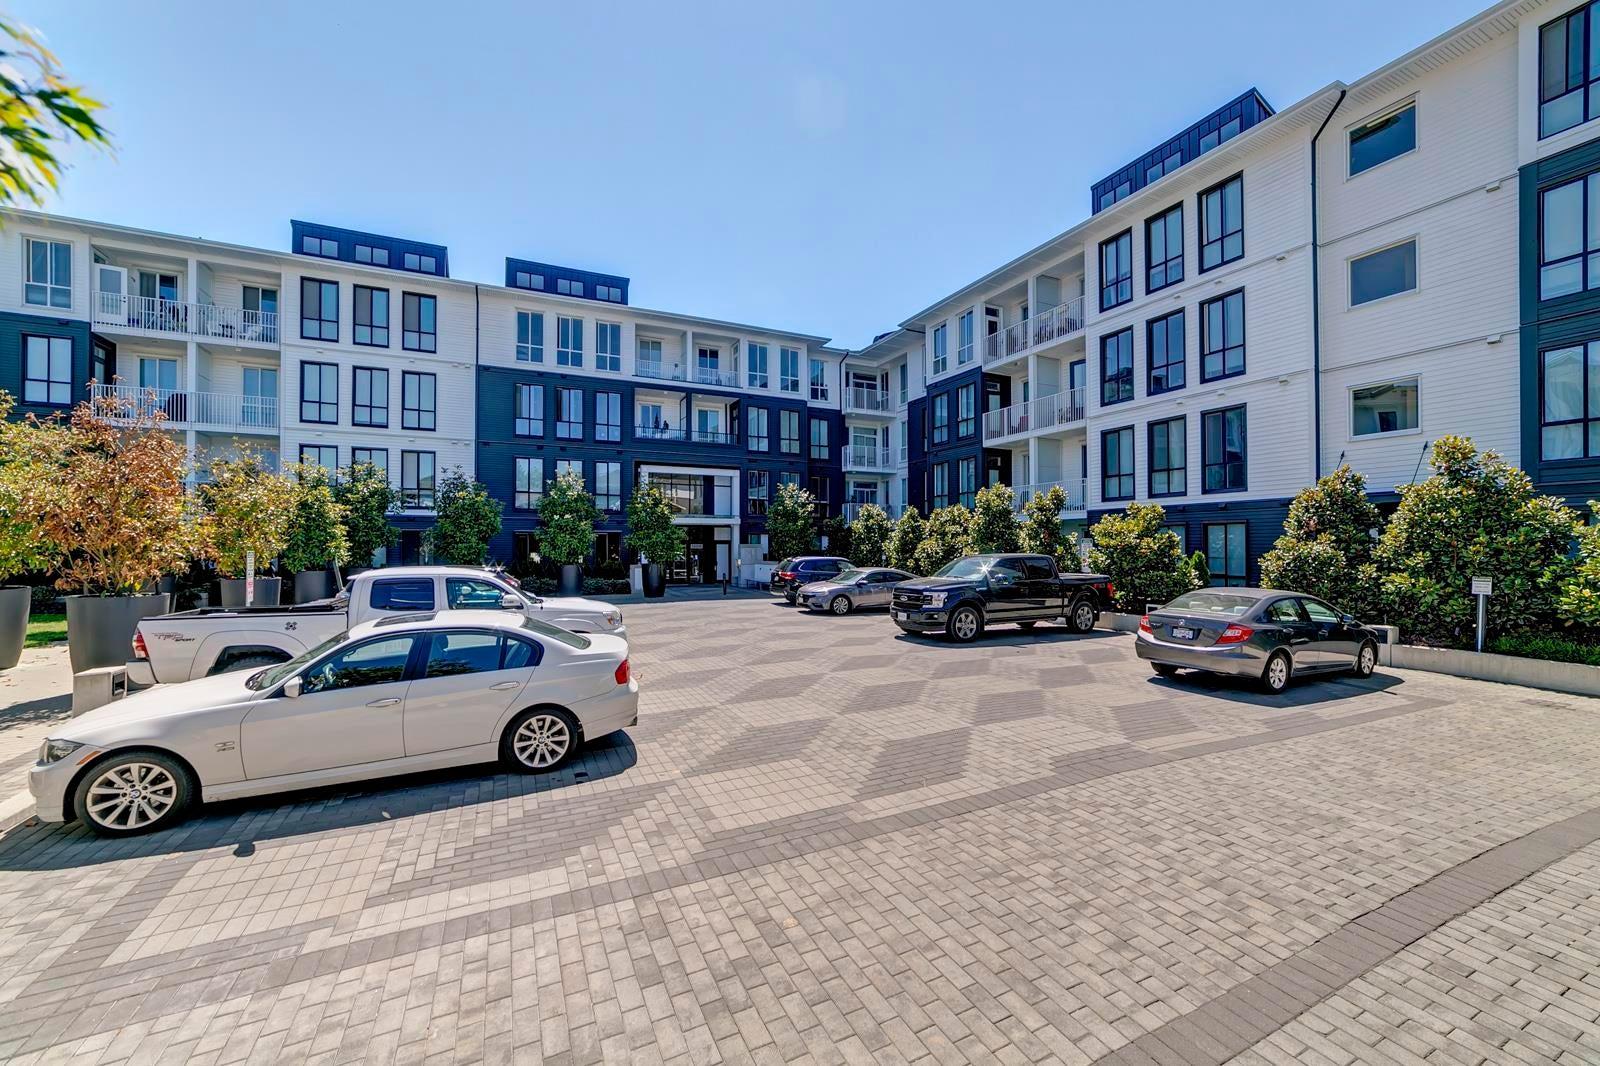 328 14968 101A AVENUE - Guildford Apartment/Condo for sale, 1 Bedroom (R2603317)